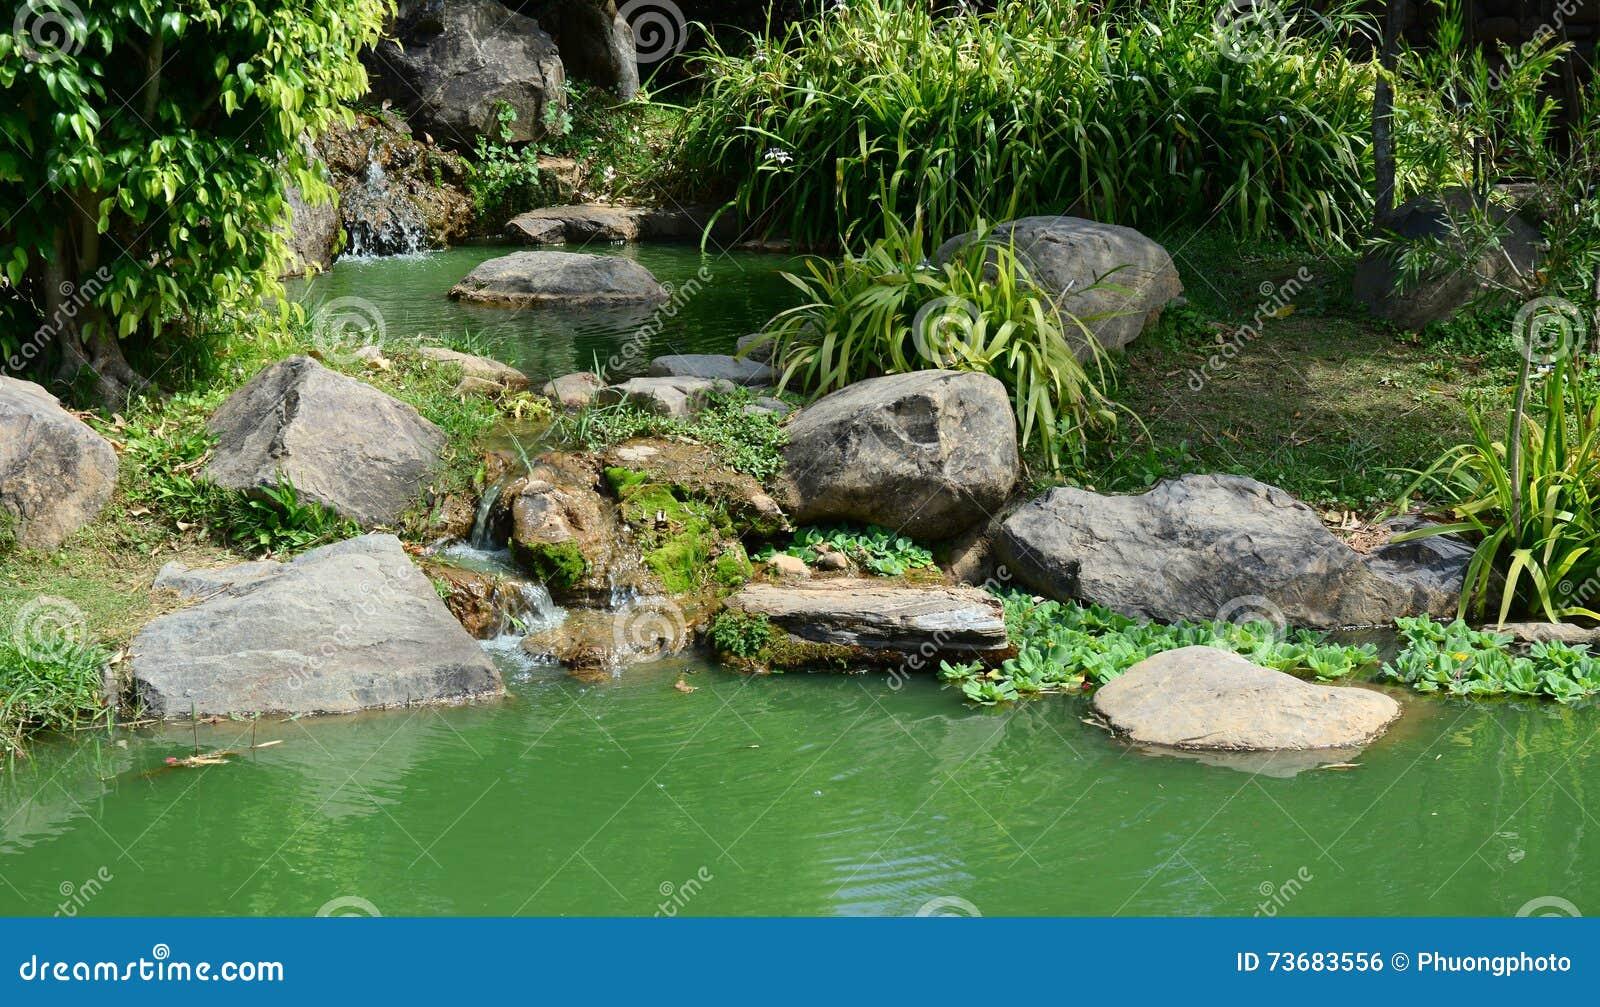 Rocce ed erba al giardino in dalat vietnam fotografia - Erba da giardino resistente ...